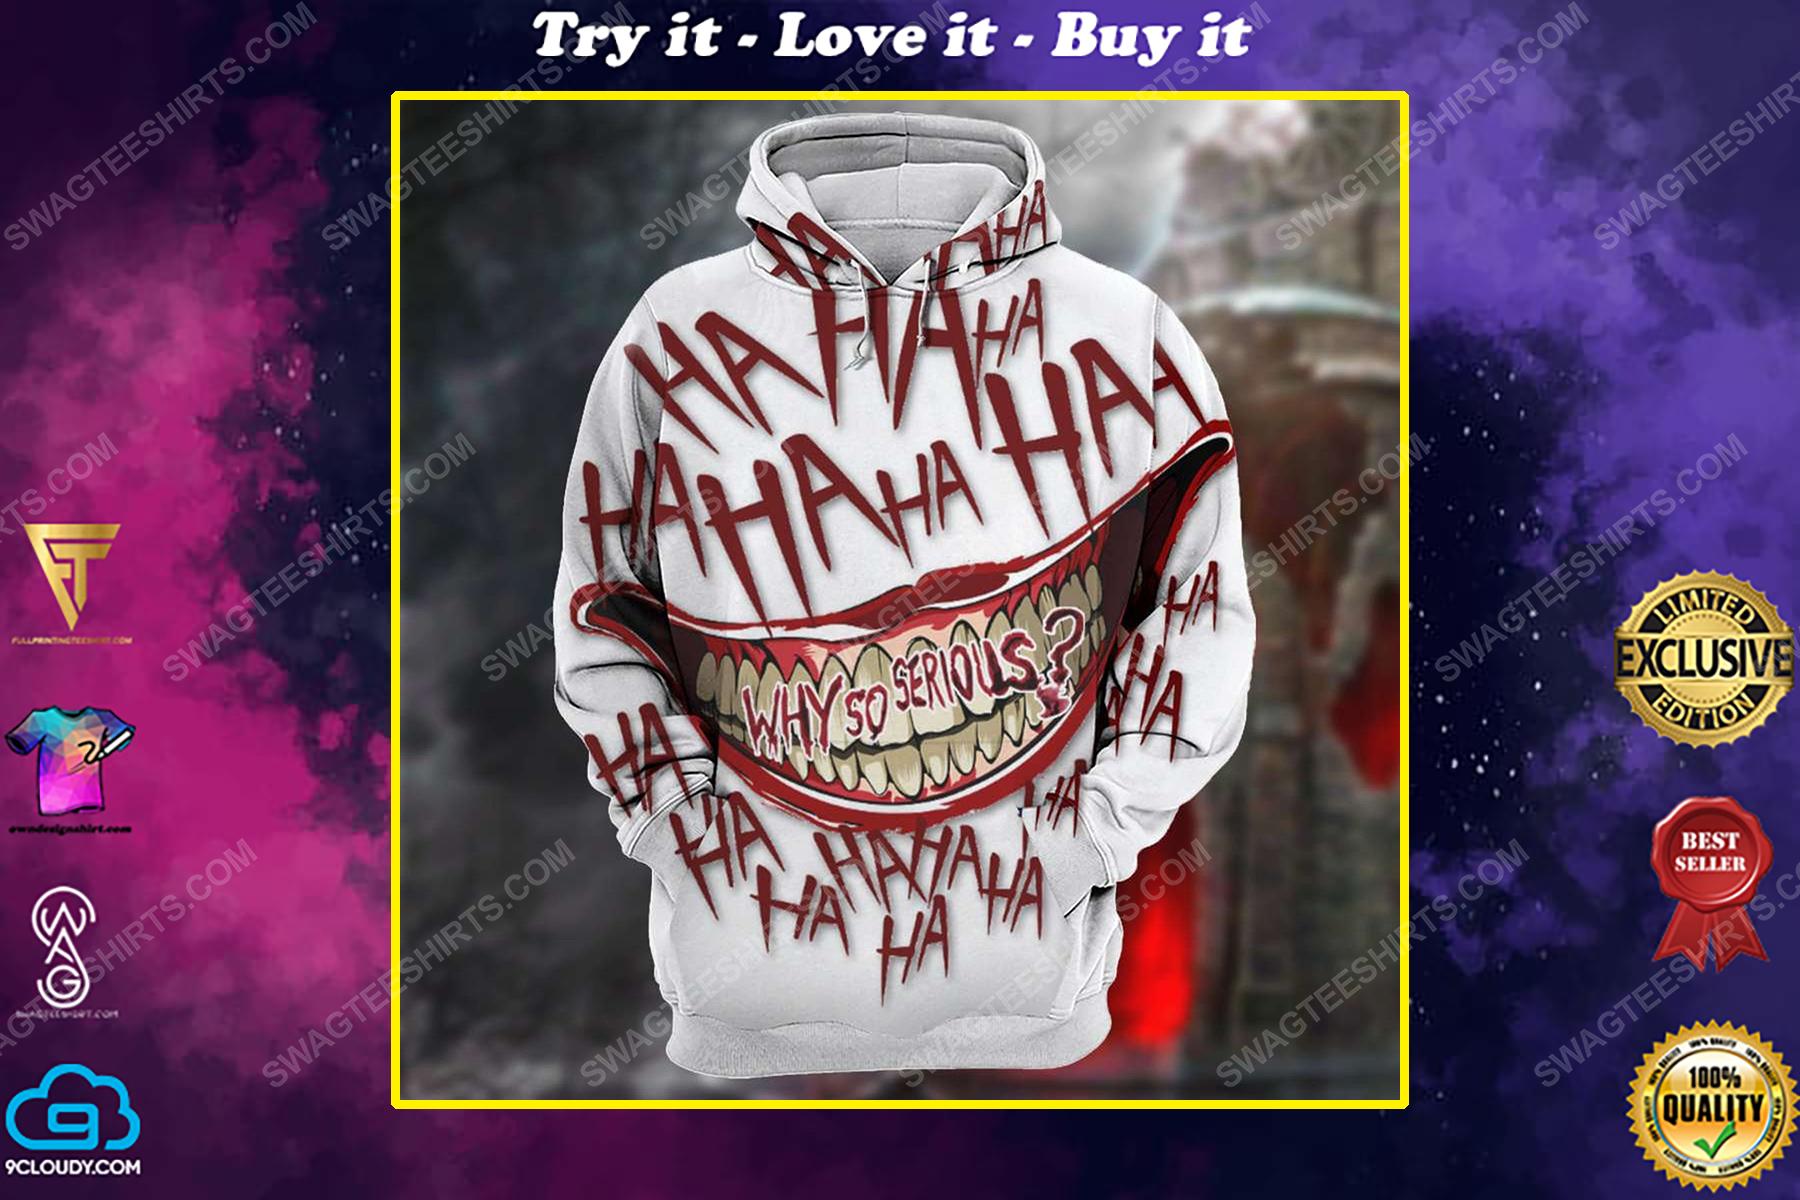 Halloween blood why so serious joker full print shirt 1